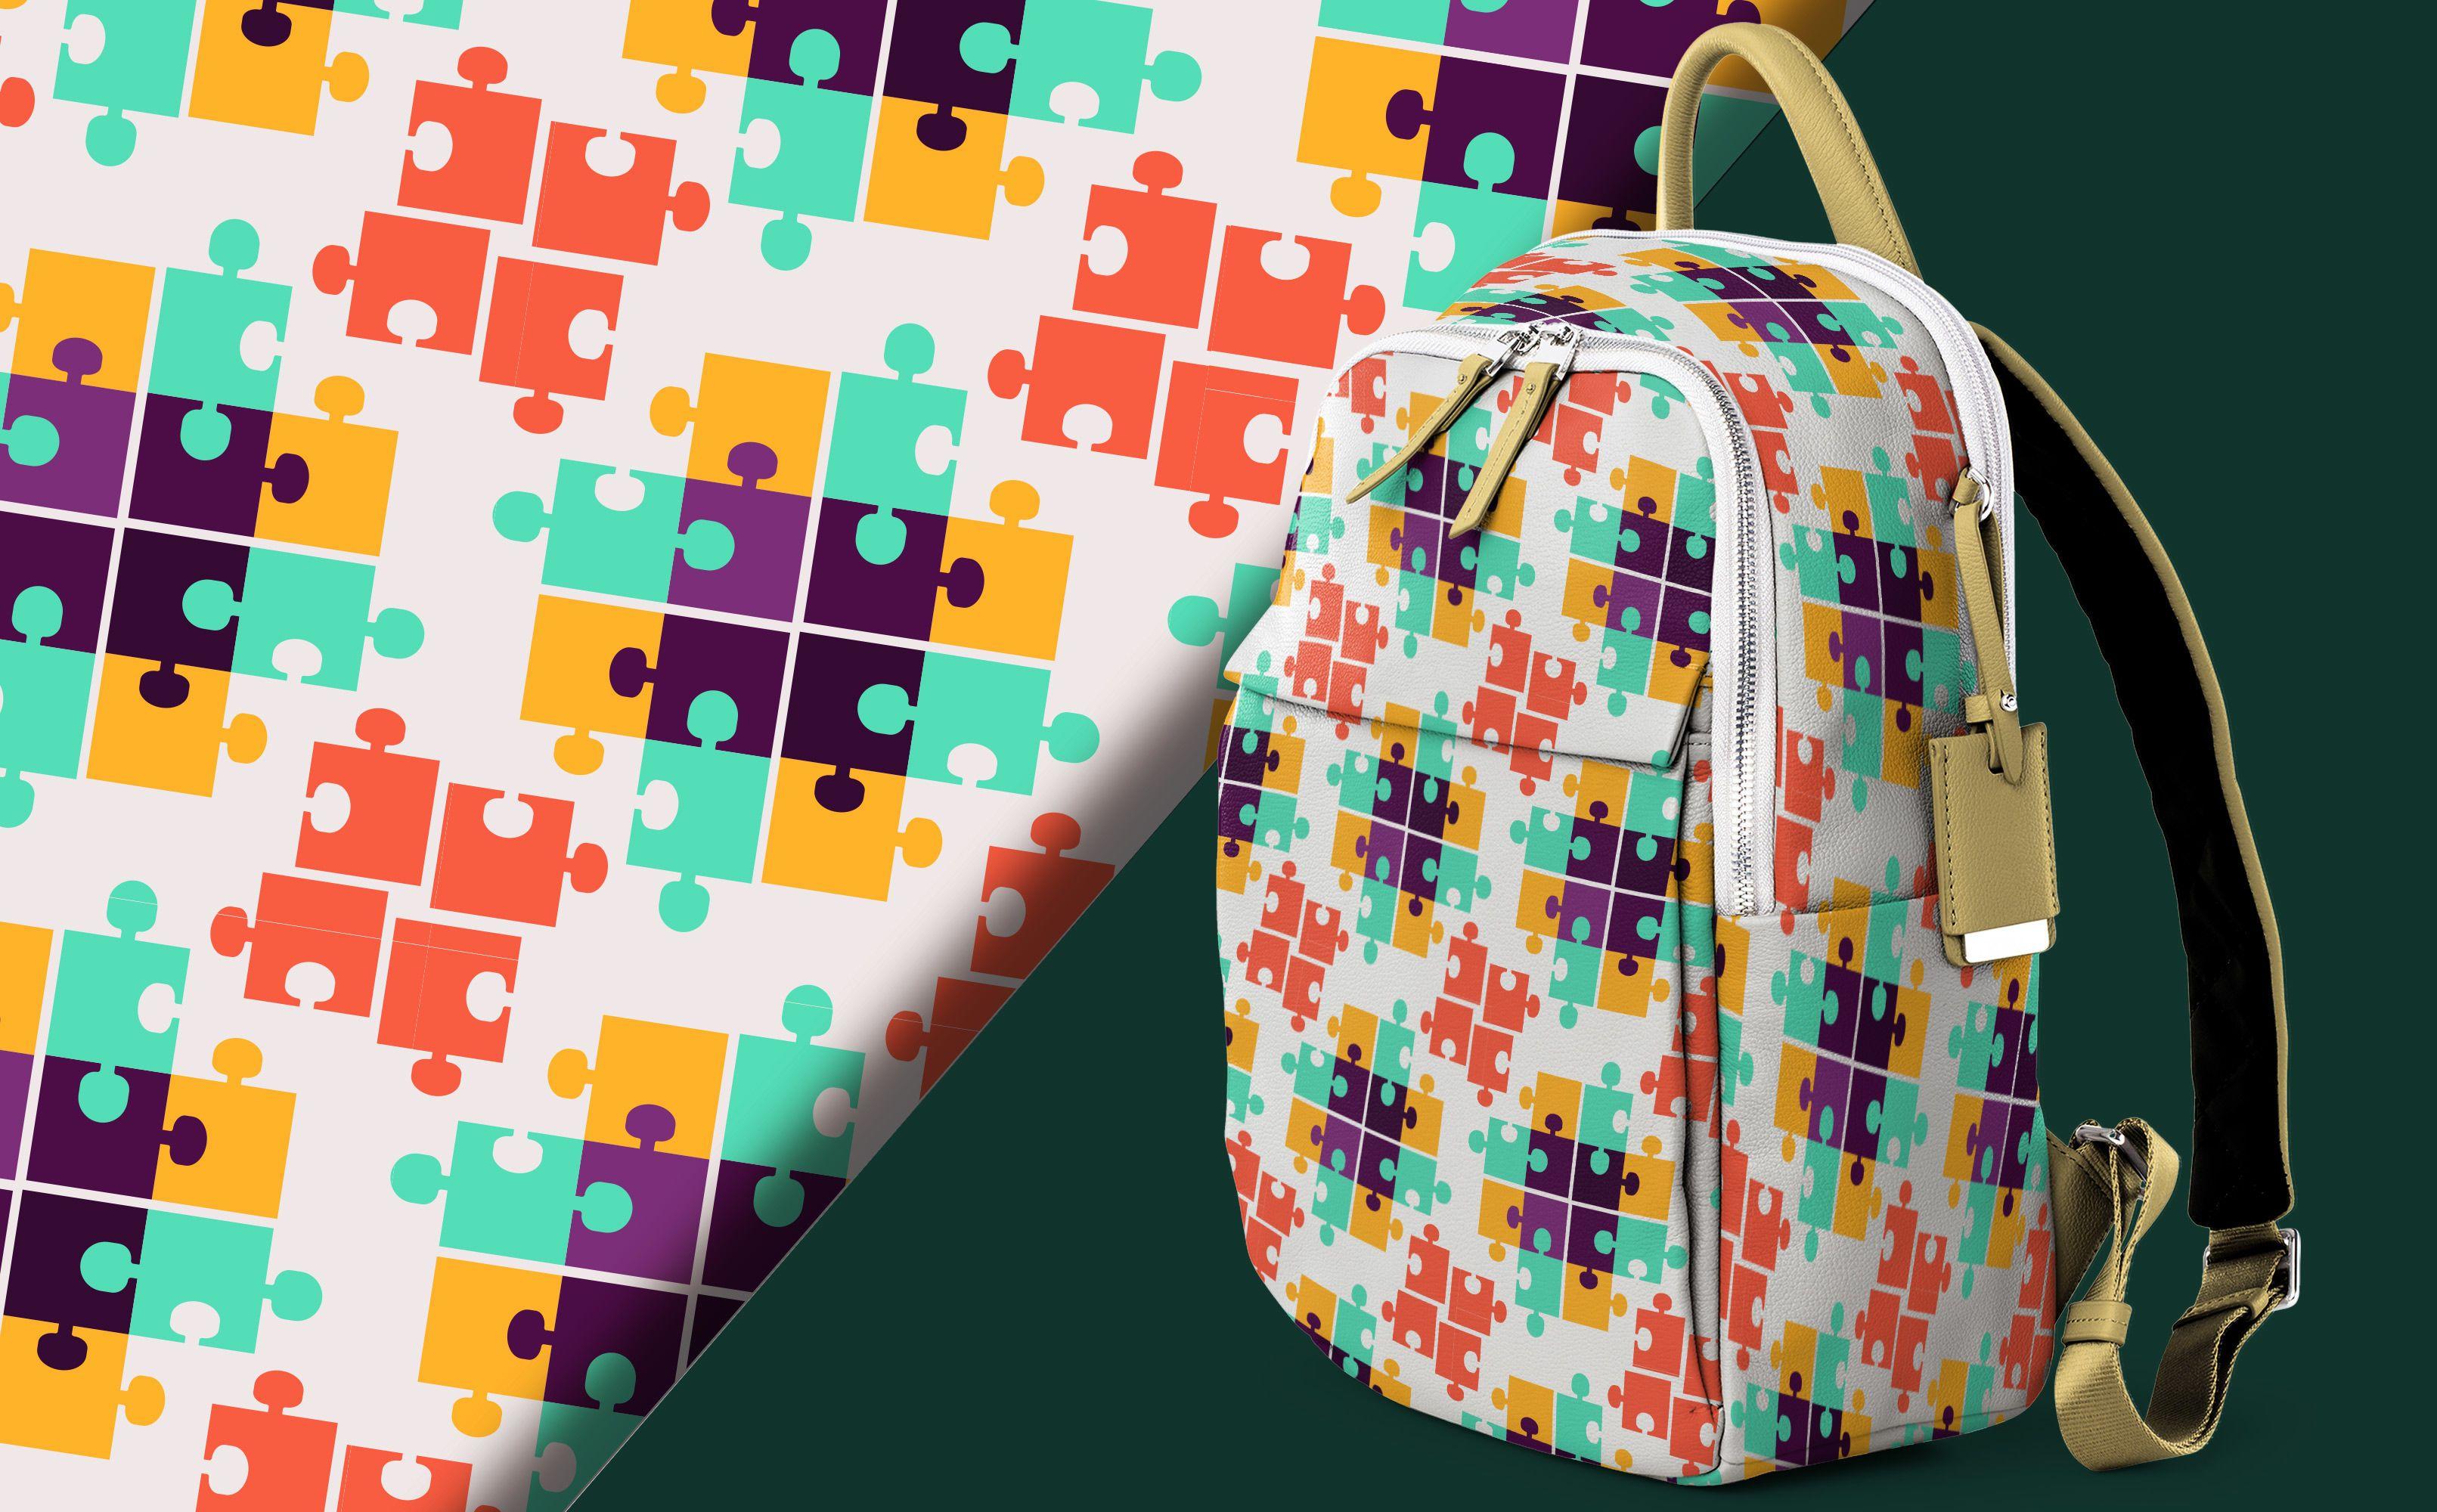 Diseño de patrón de rompecabezas colorido